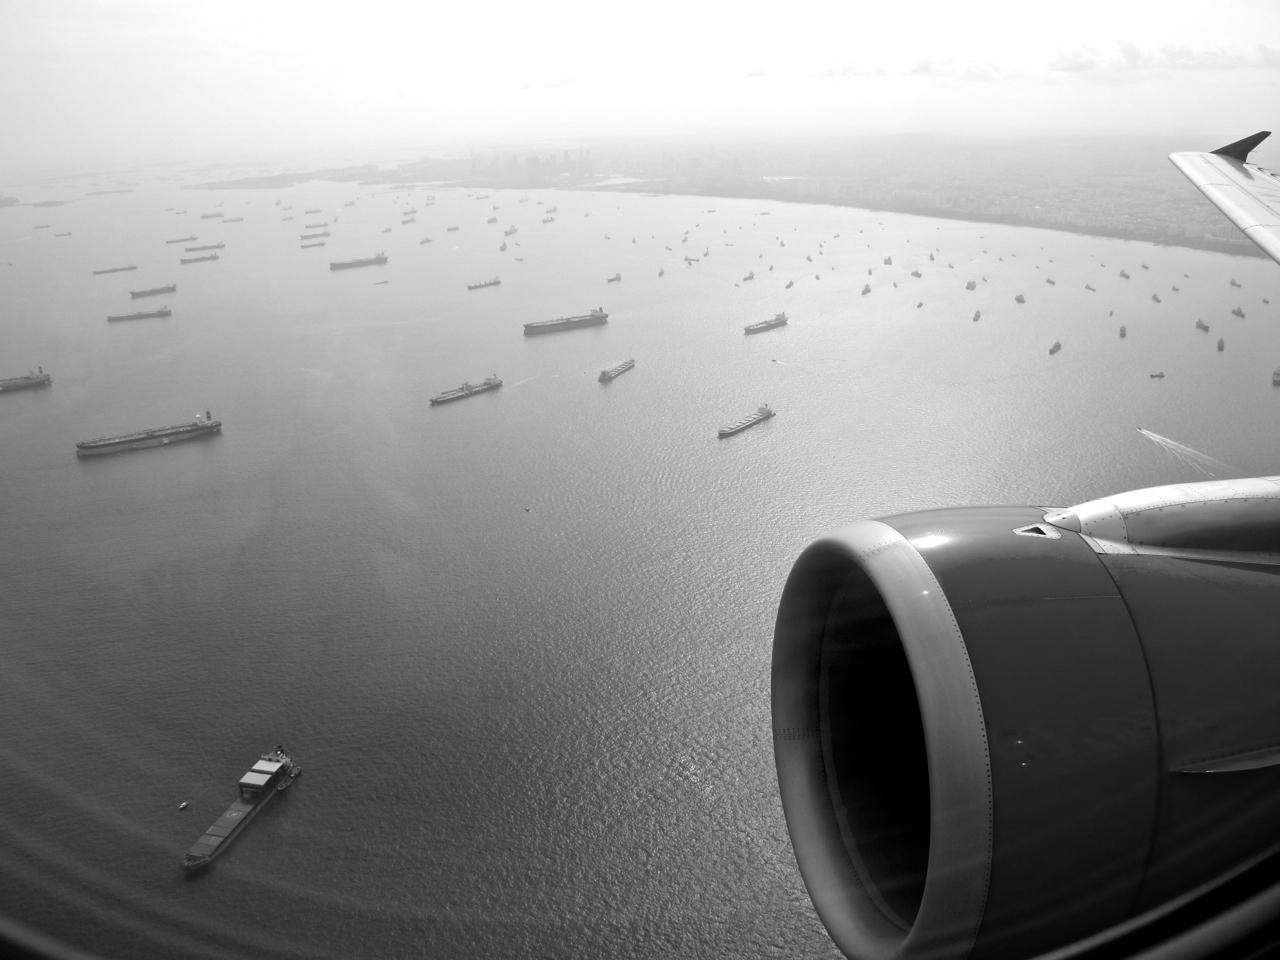 Singapore aerial photograph